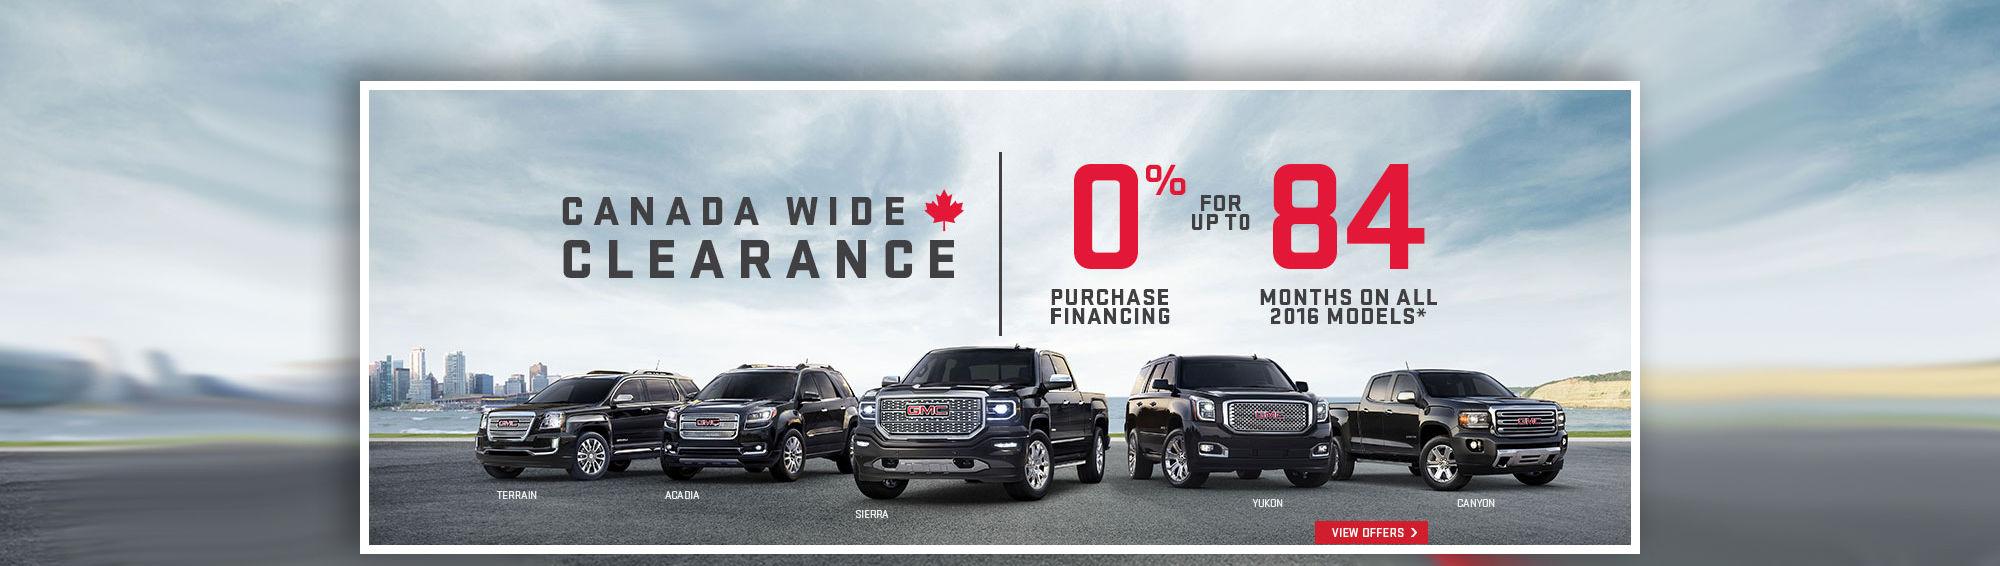 GMC 2016 Canada Wide Clearance